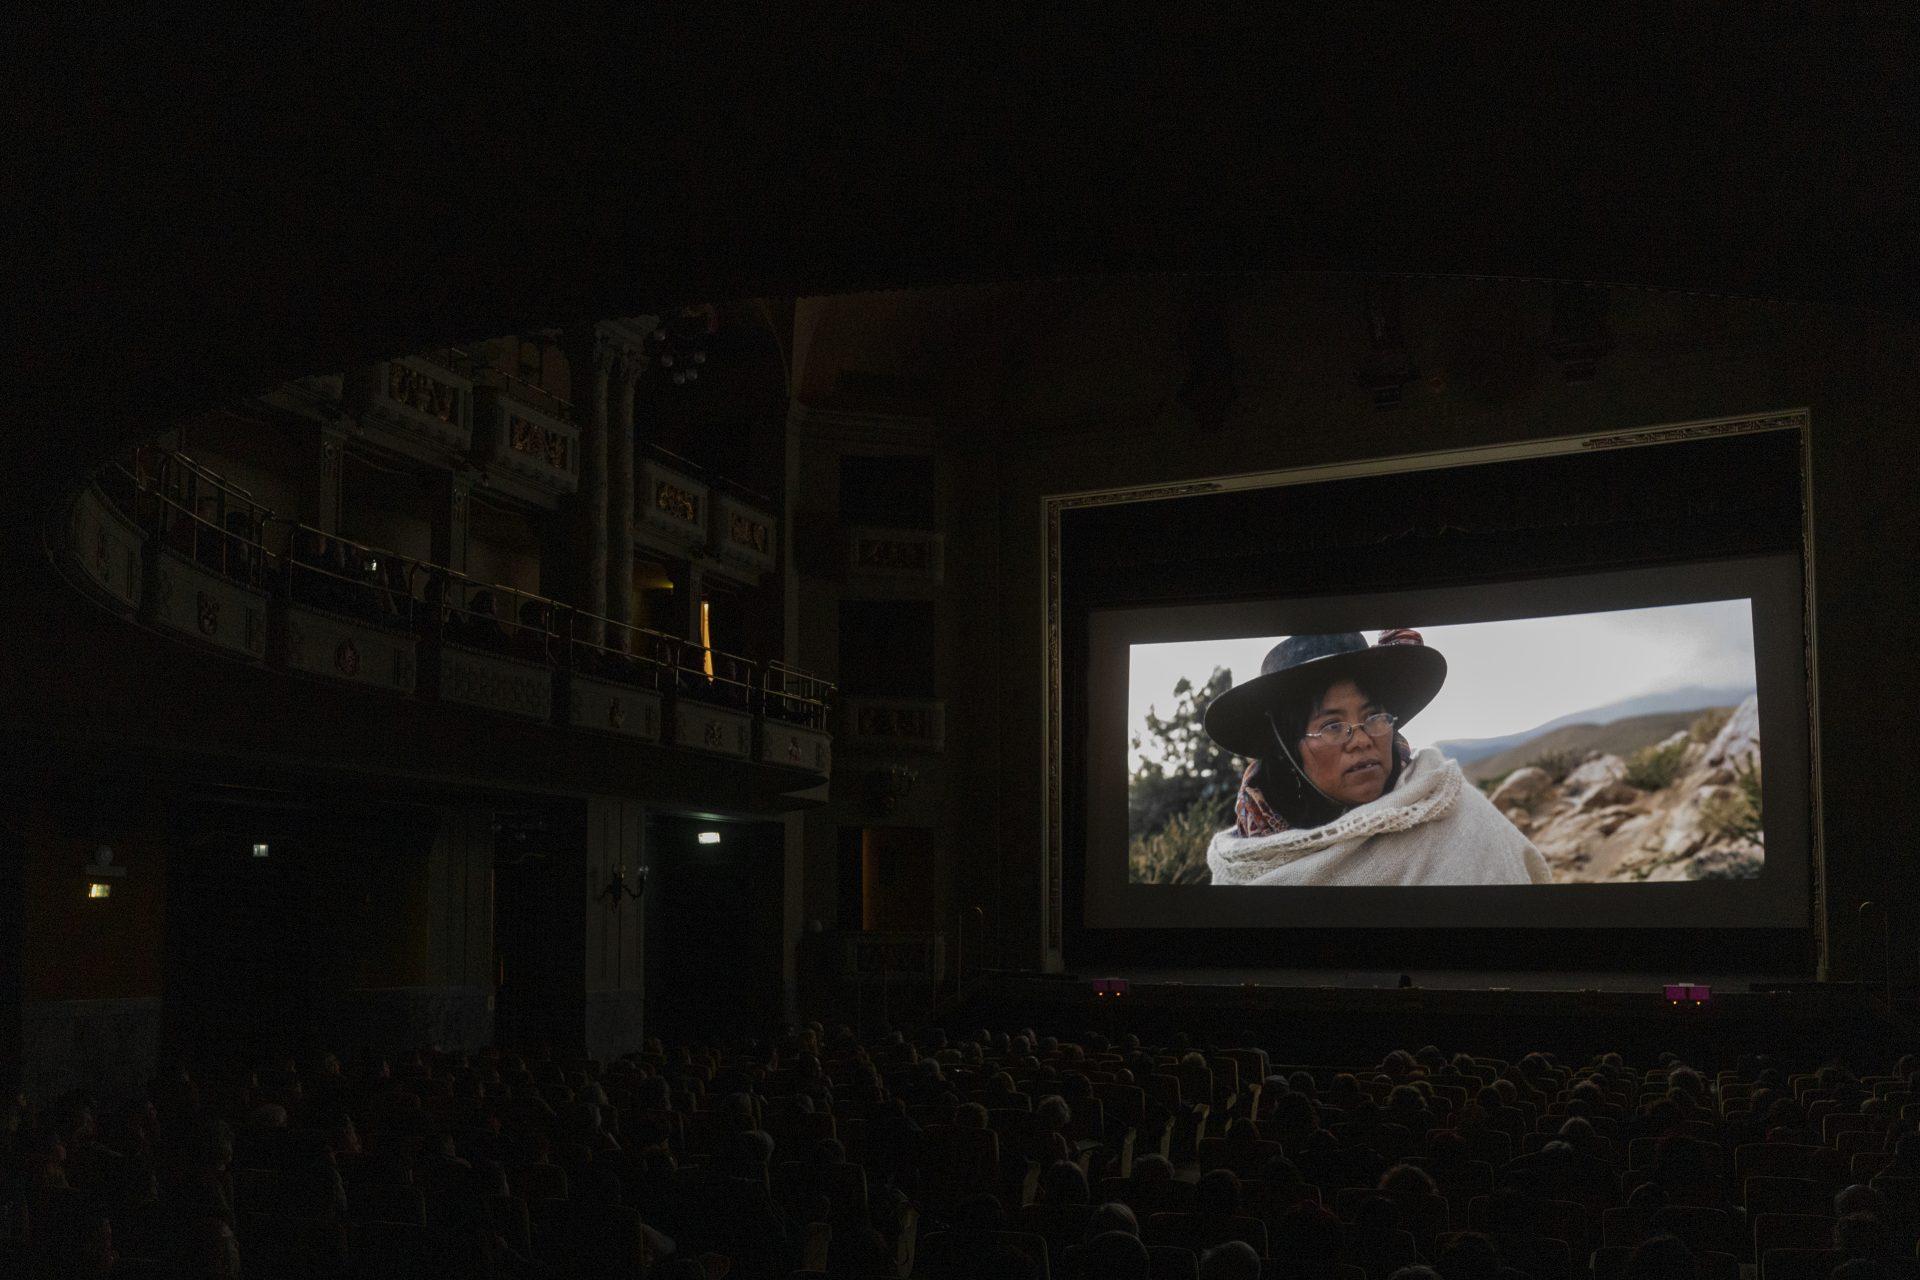 Tomás Saraceno. Aria at Cinema Odeon